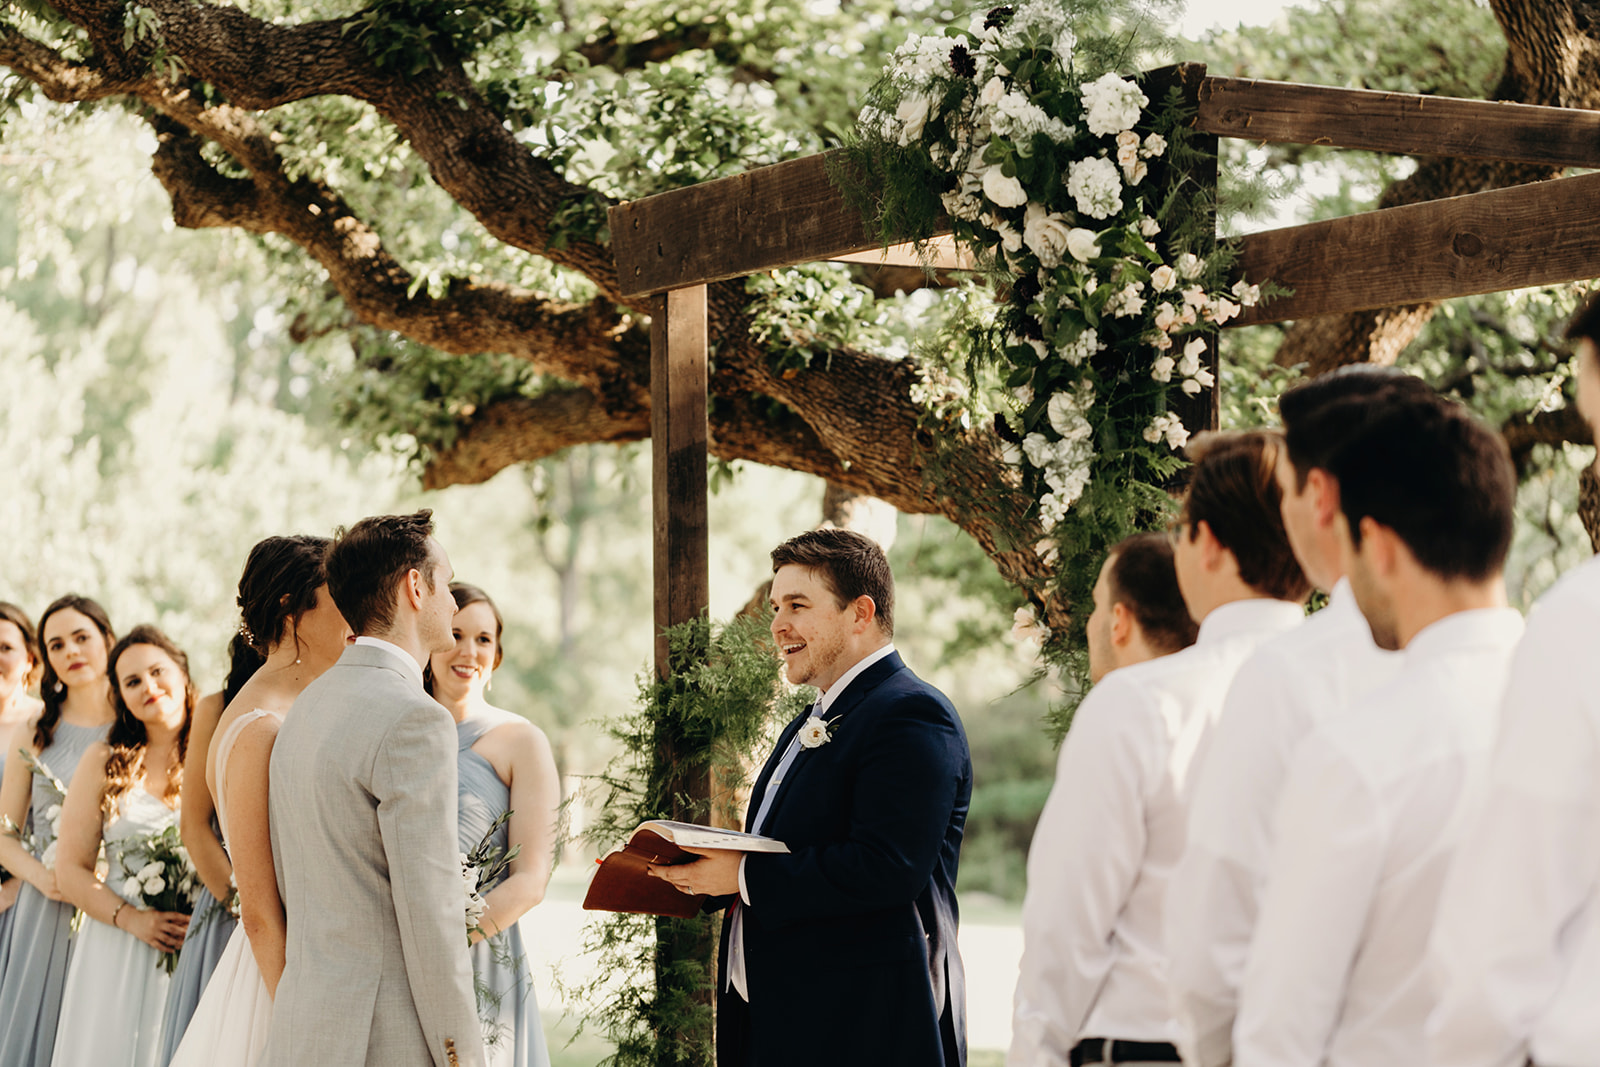 austin-wedding-lindsey-bryce-344.jpg